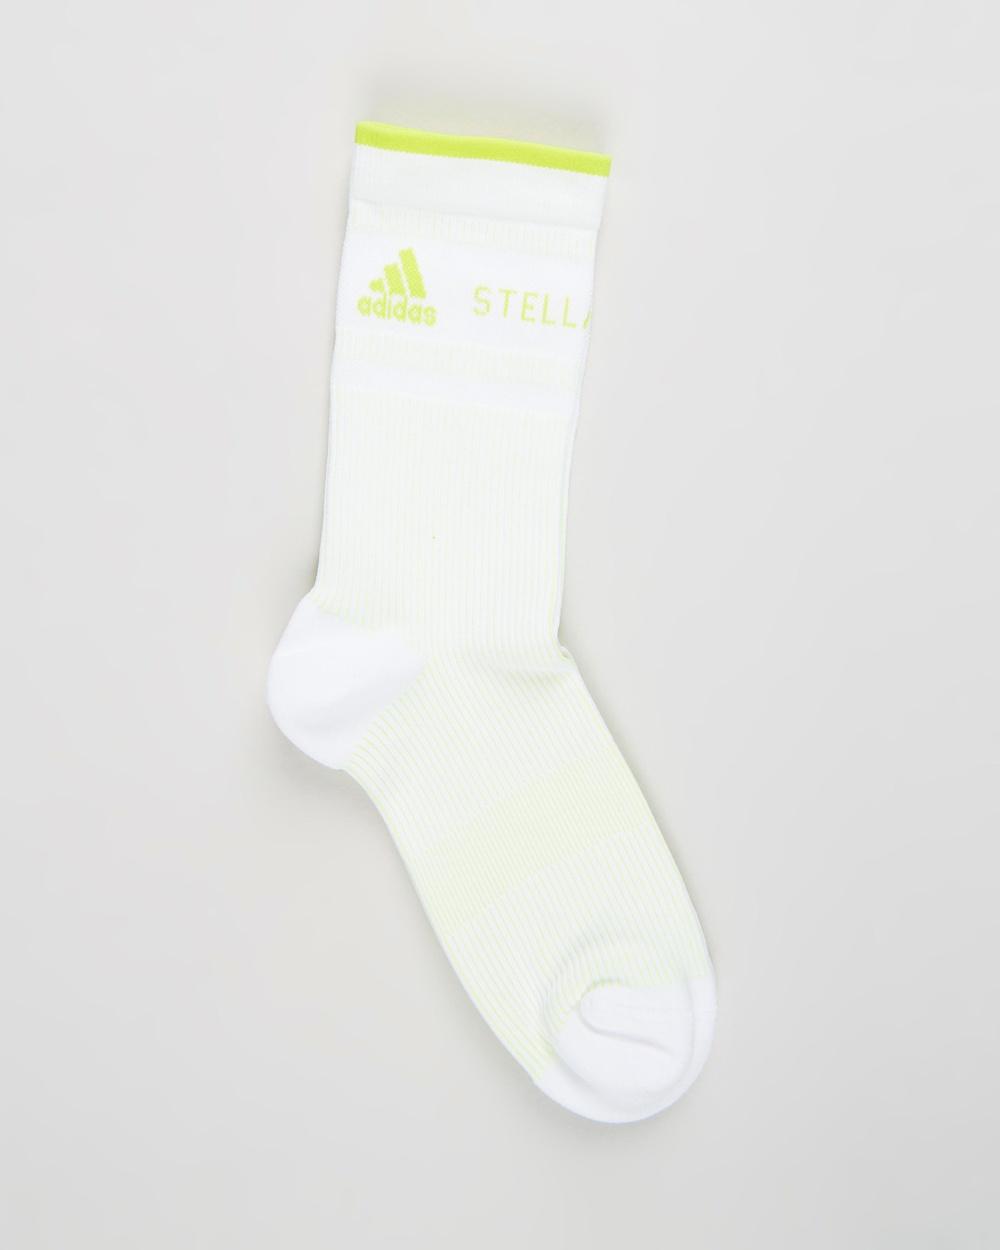 adidas by Stella McCartney ASMC Crew Socks White & Neon Yellow